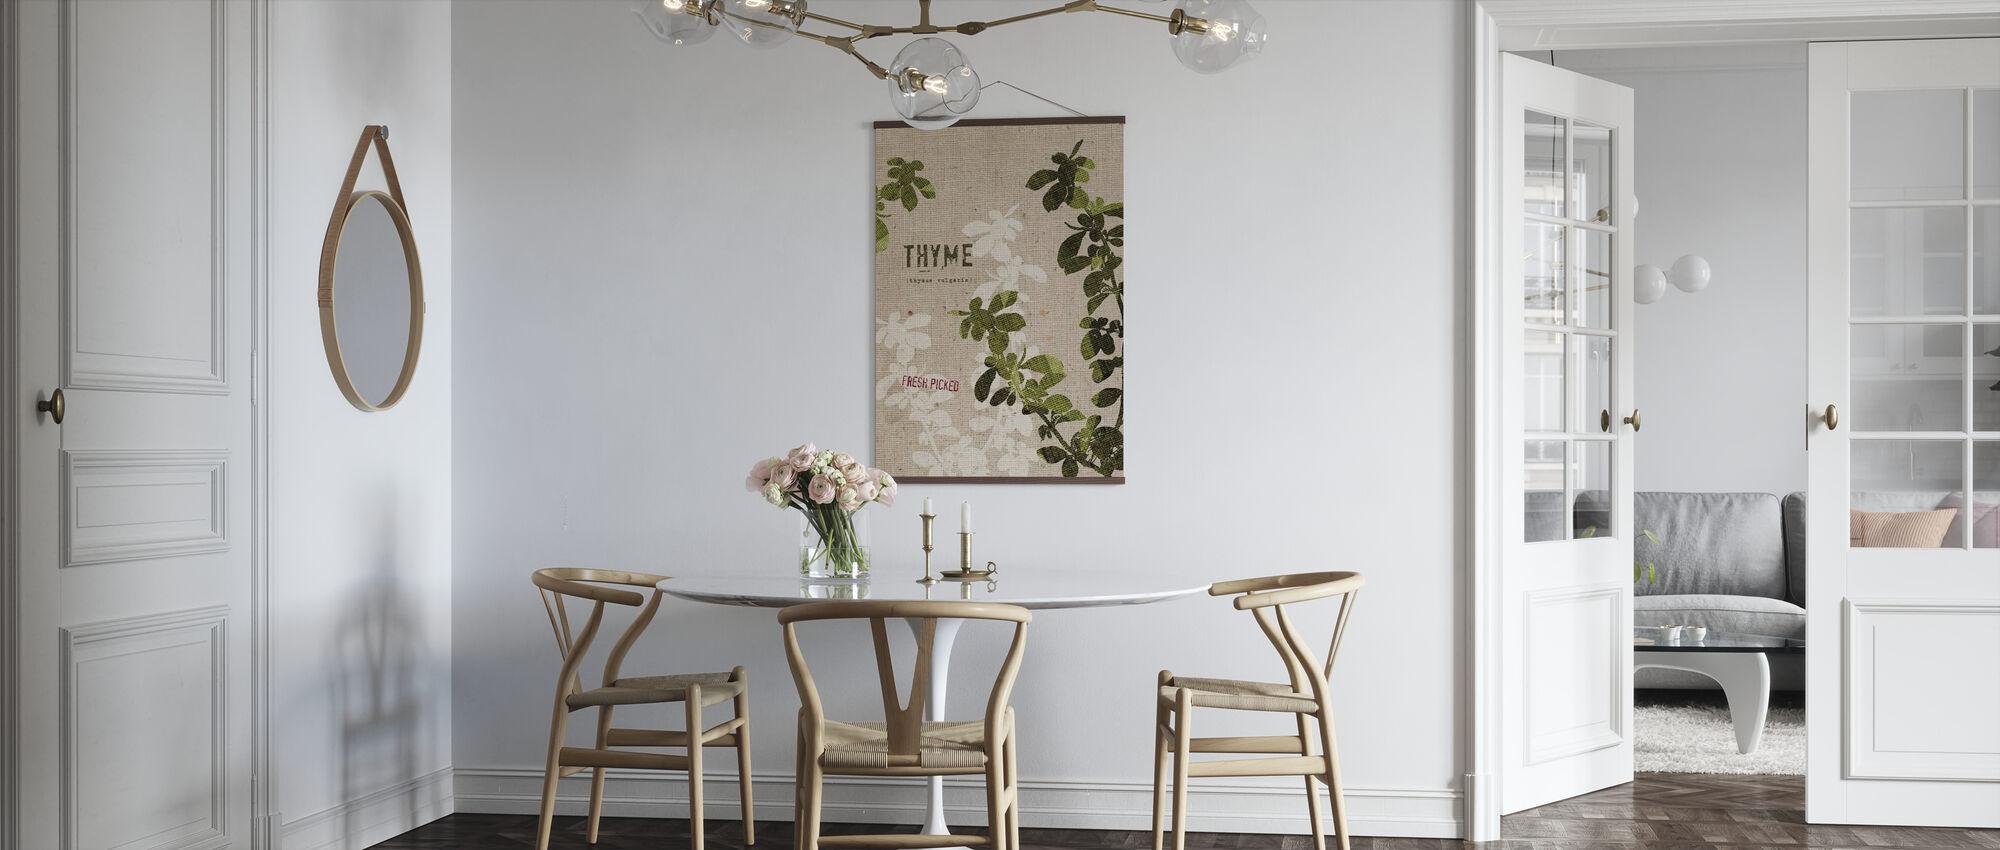 Organic Thyme - Poster - Kitchen